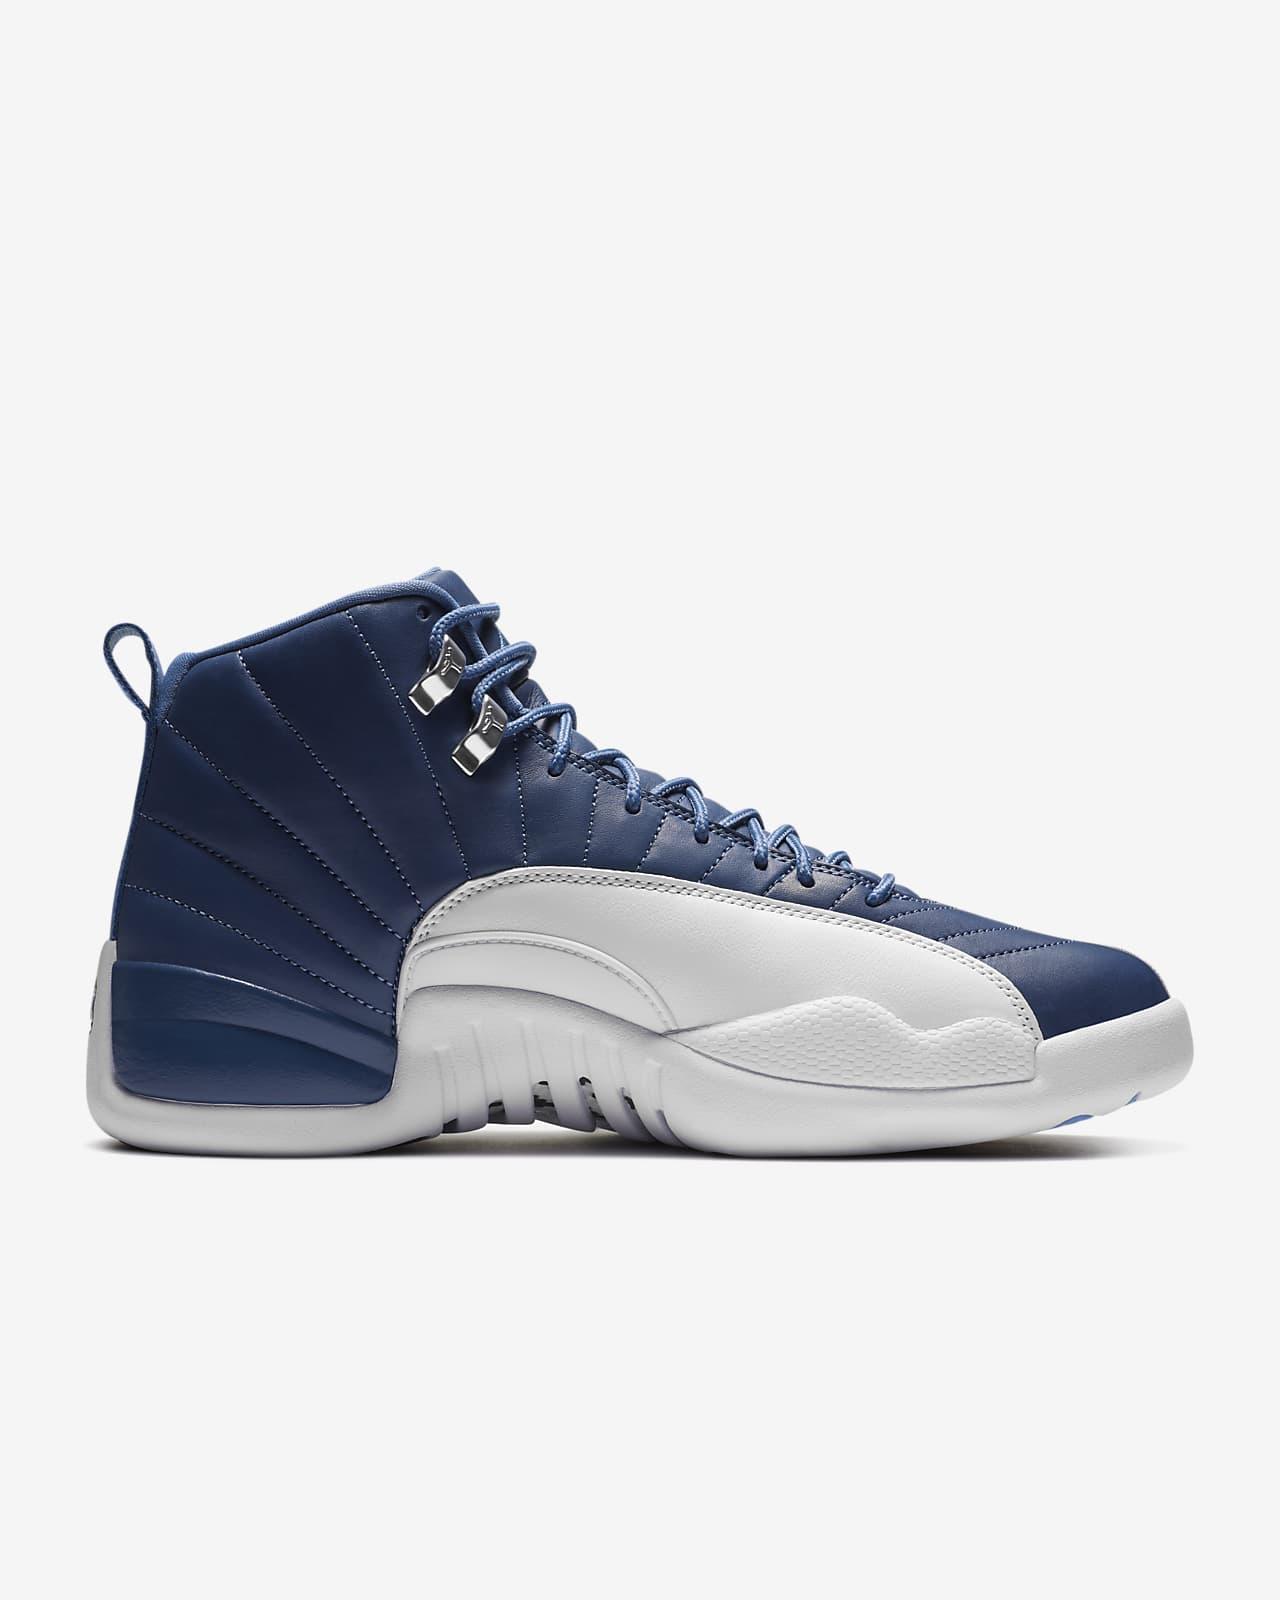 Nike Jordan Air Jordan 12 Retro Chaussure de Basketball